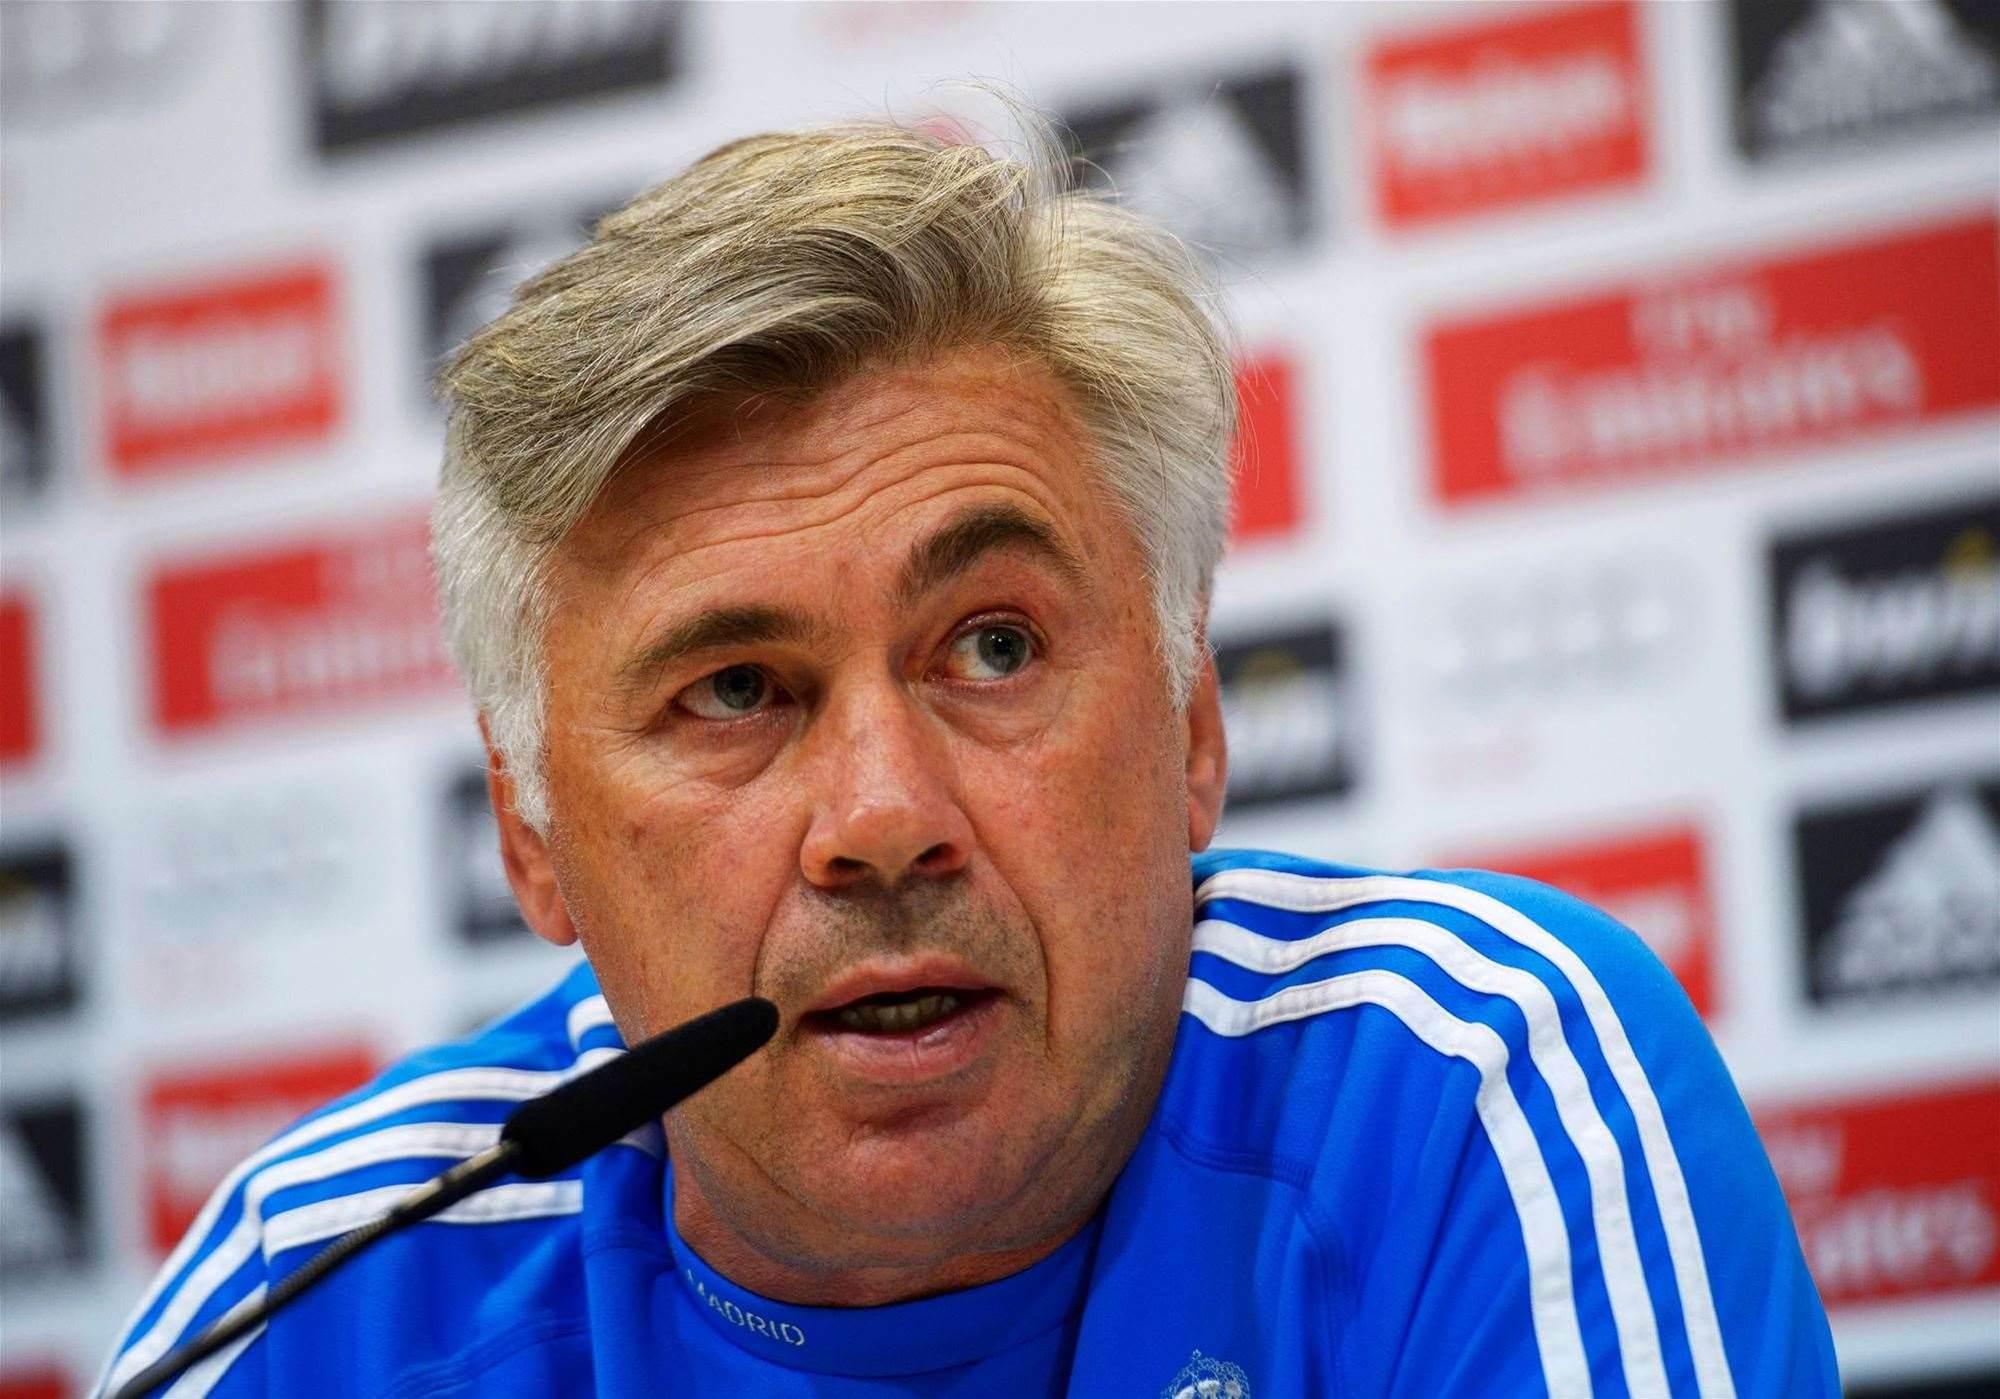 Ancelotti: We have to improve